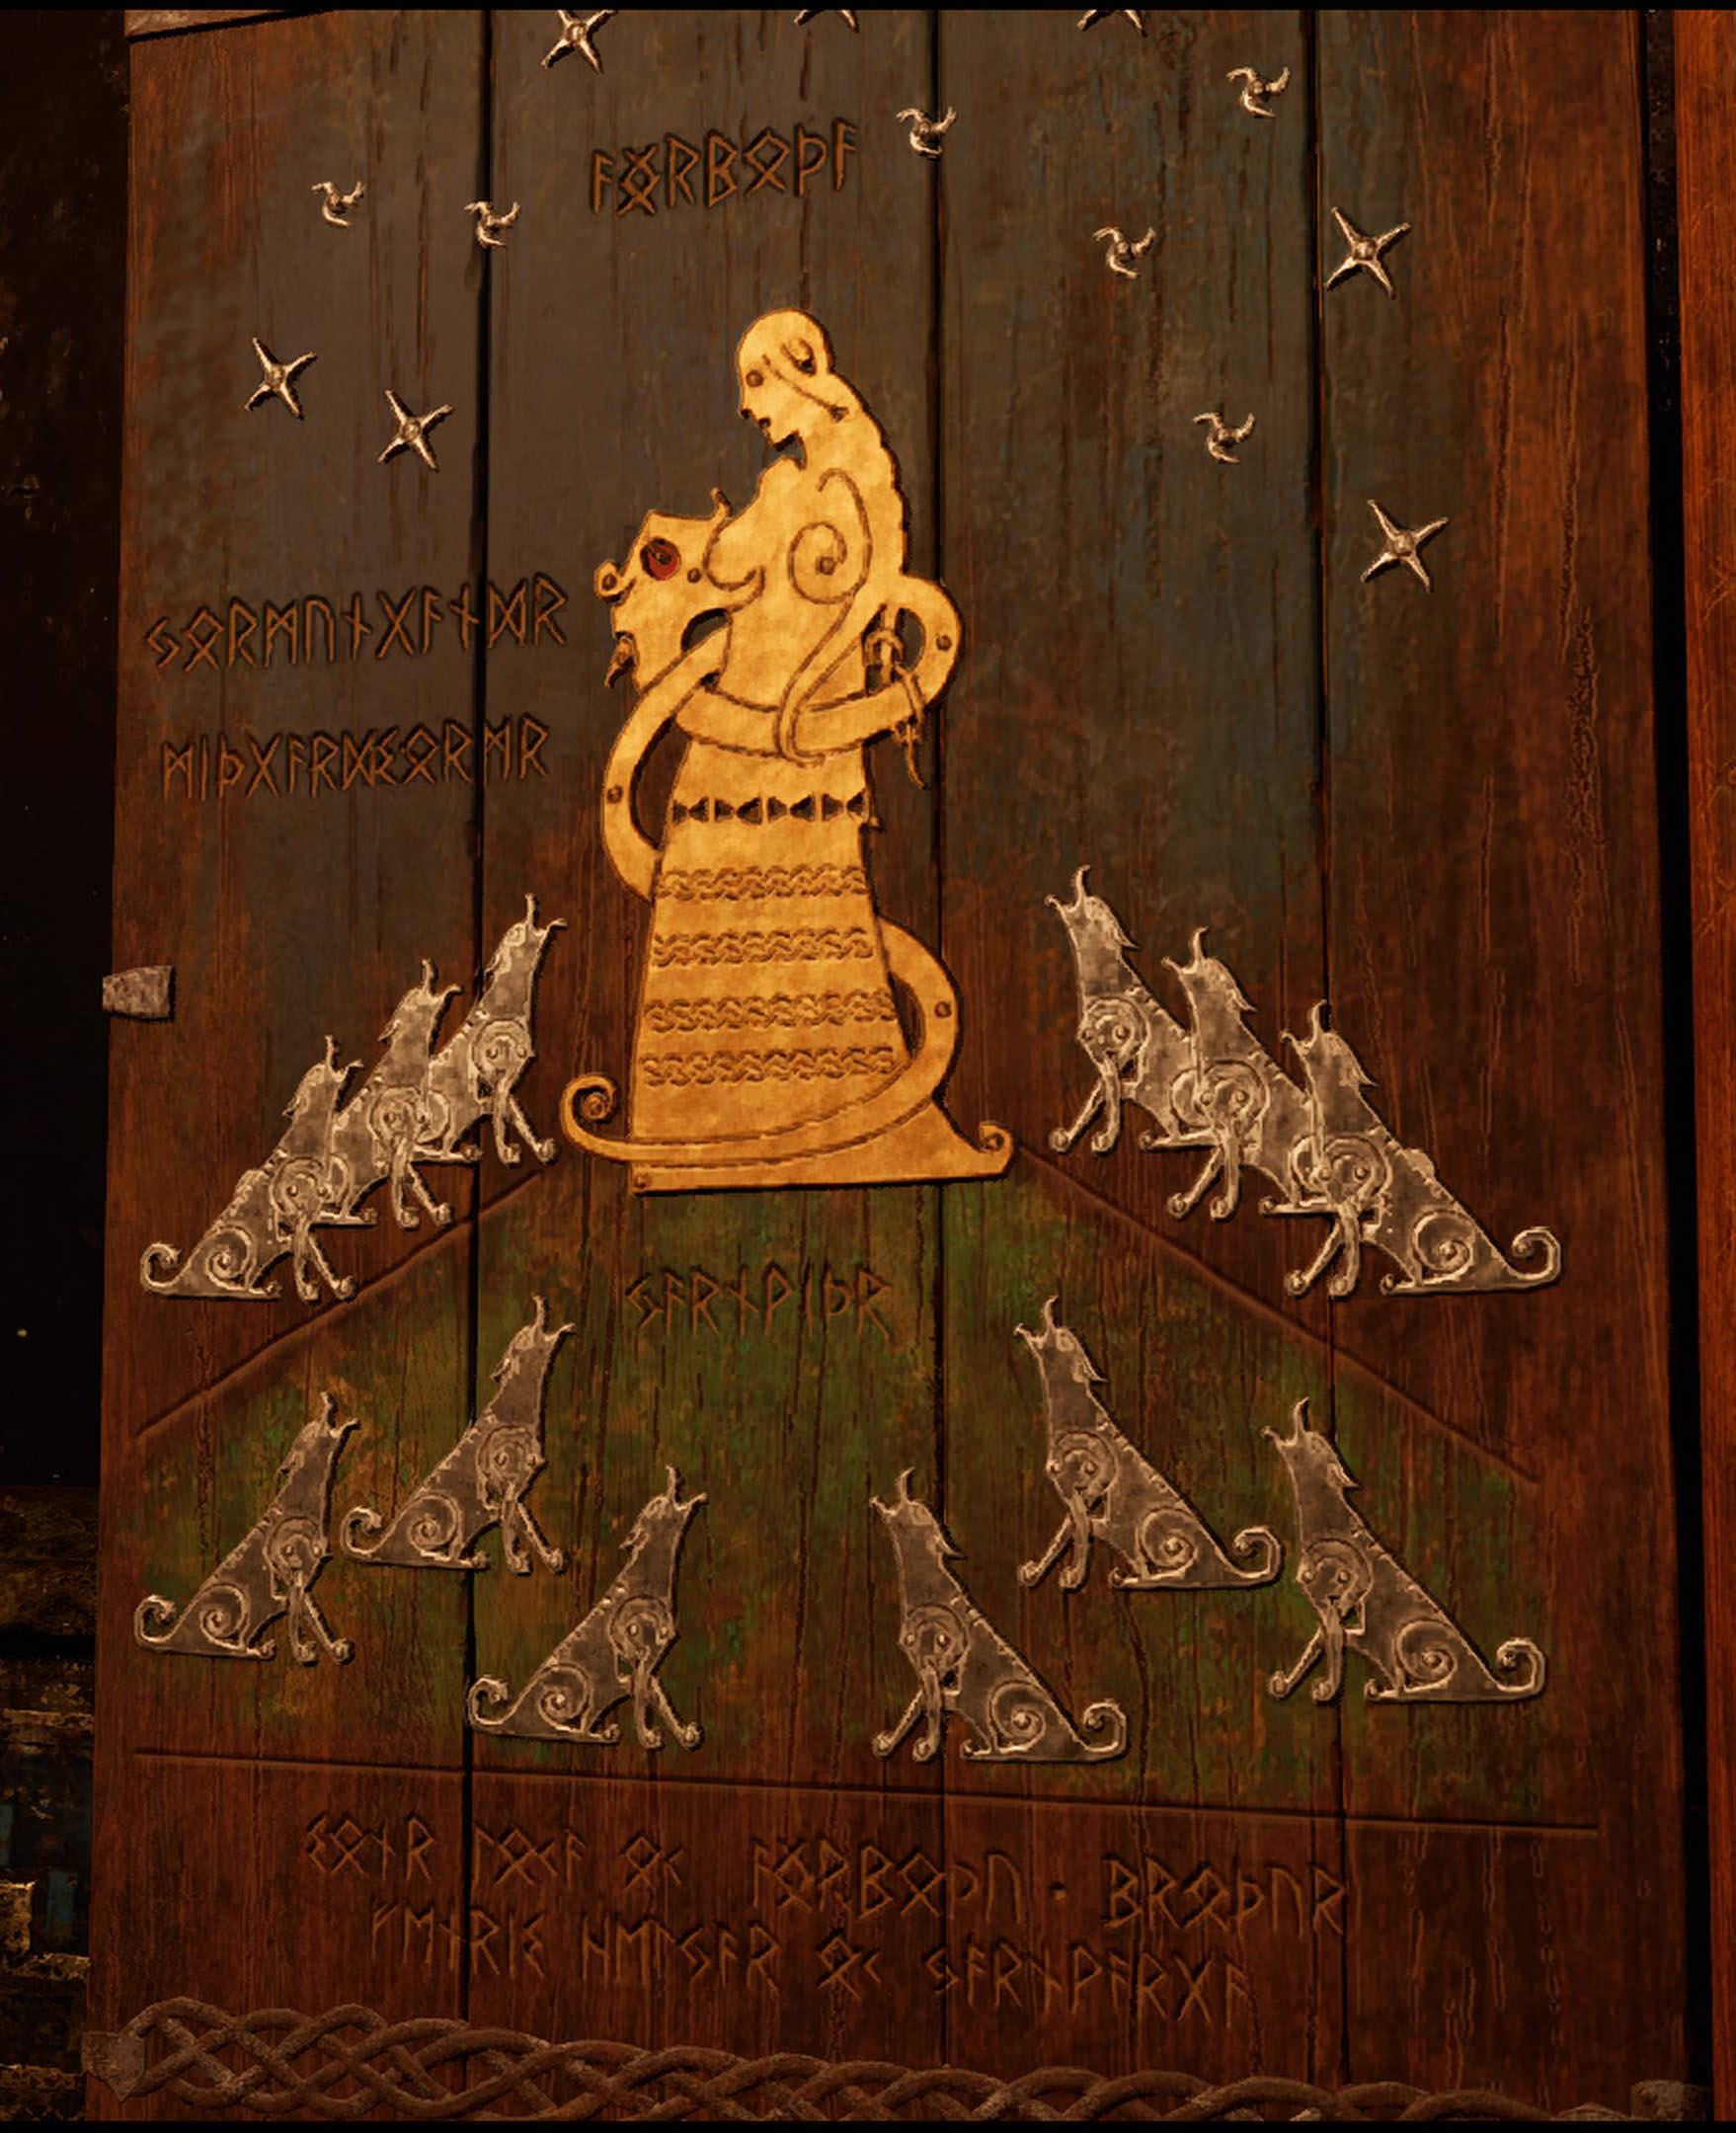 J tnar shrines god of war wiki fandom powered by wikia - God of war jormungandr ...